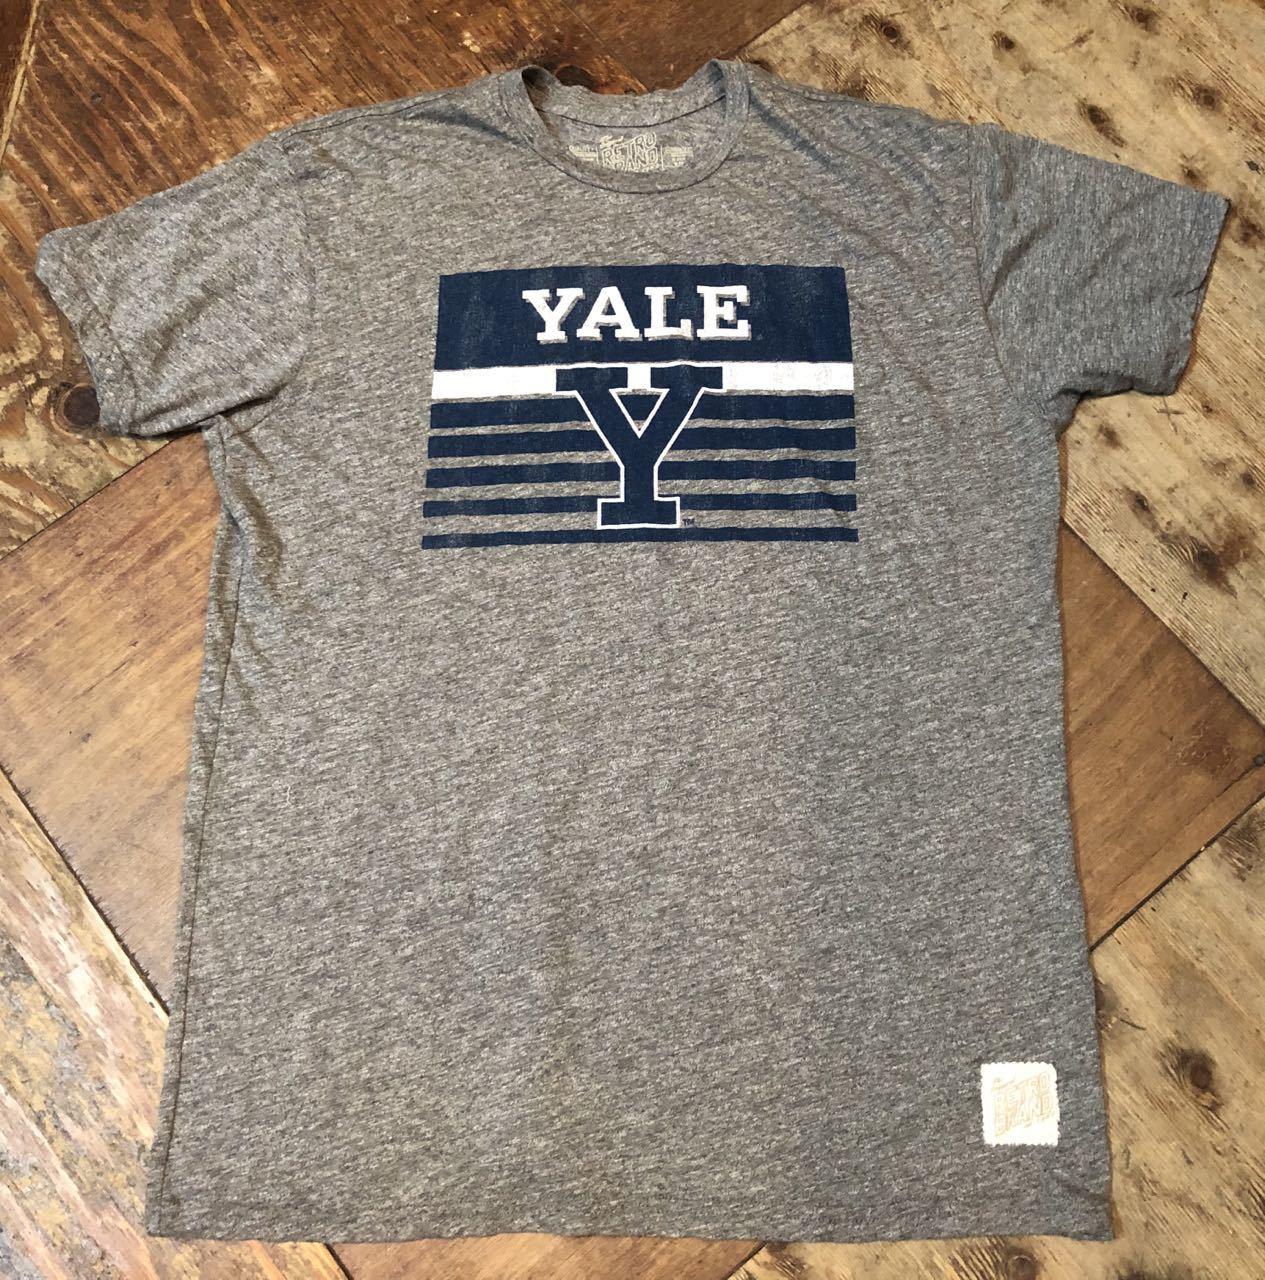 6月10日(月)入荷! MADE IN U.S.A YALE大学 Tシャツ!_c0144020_14453430.jpg